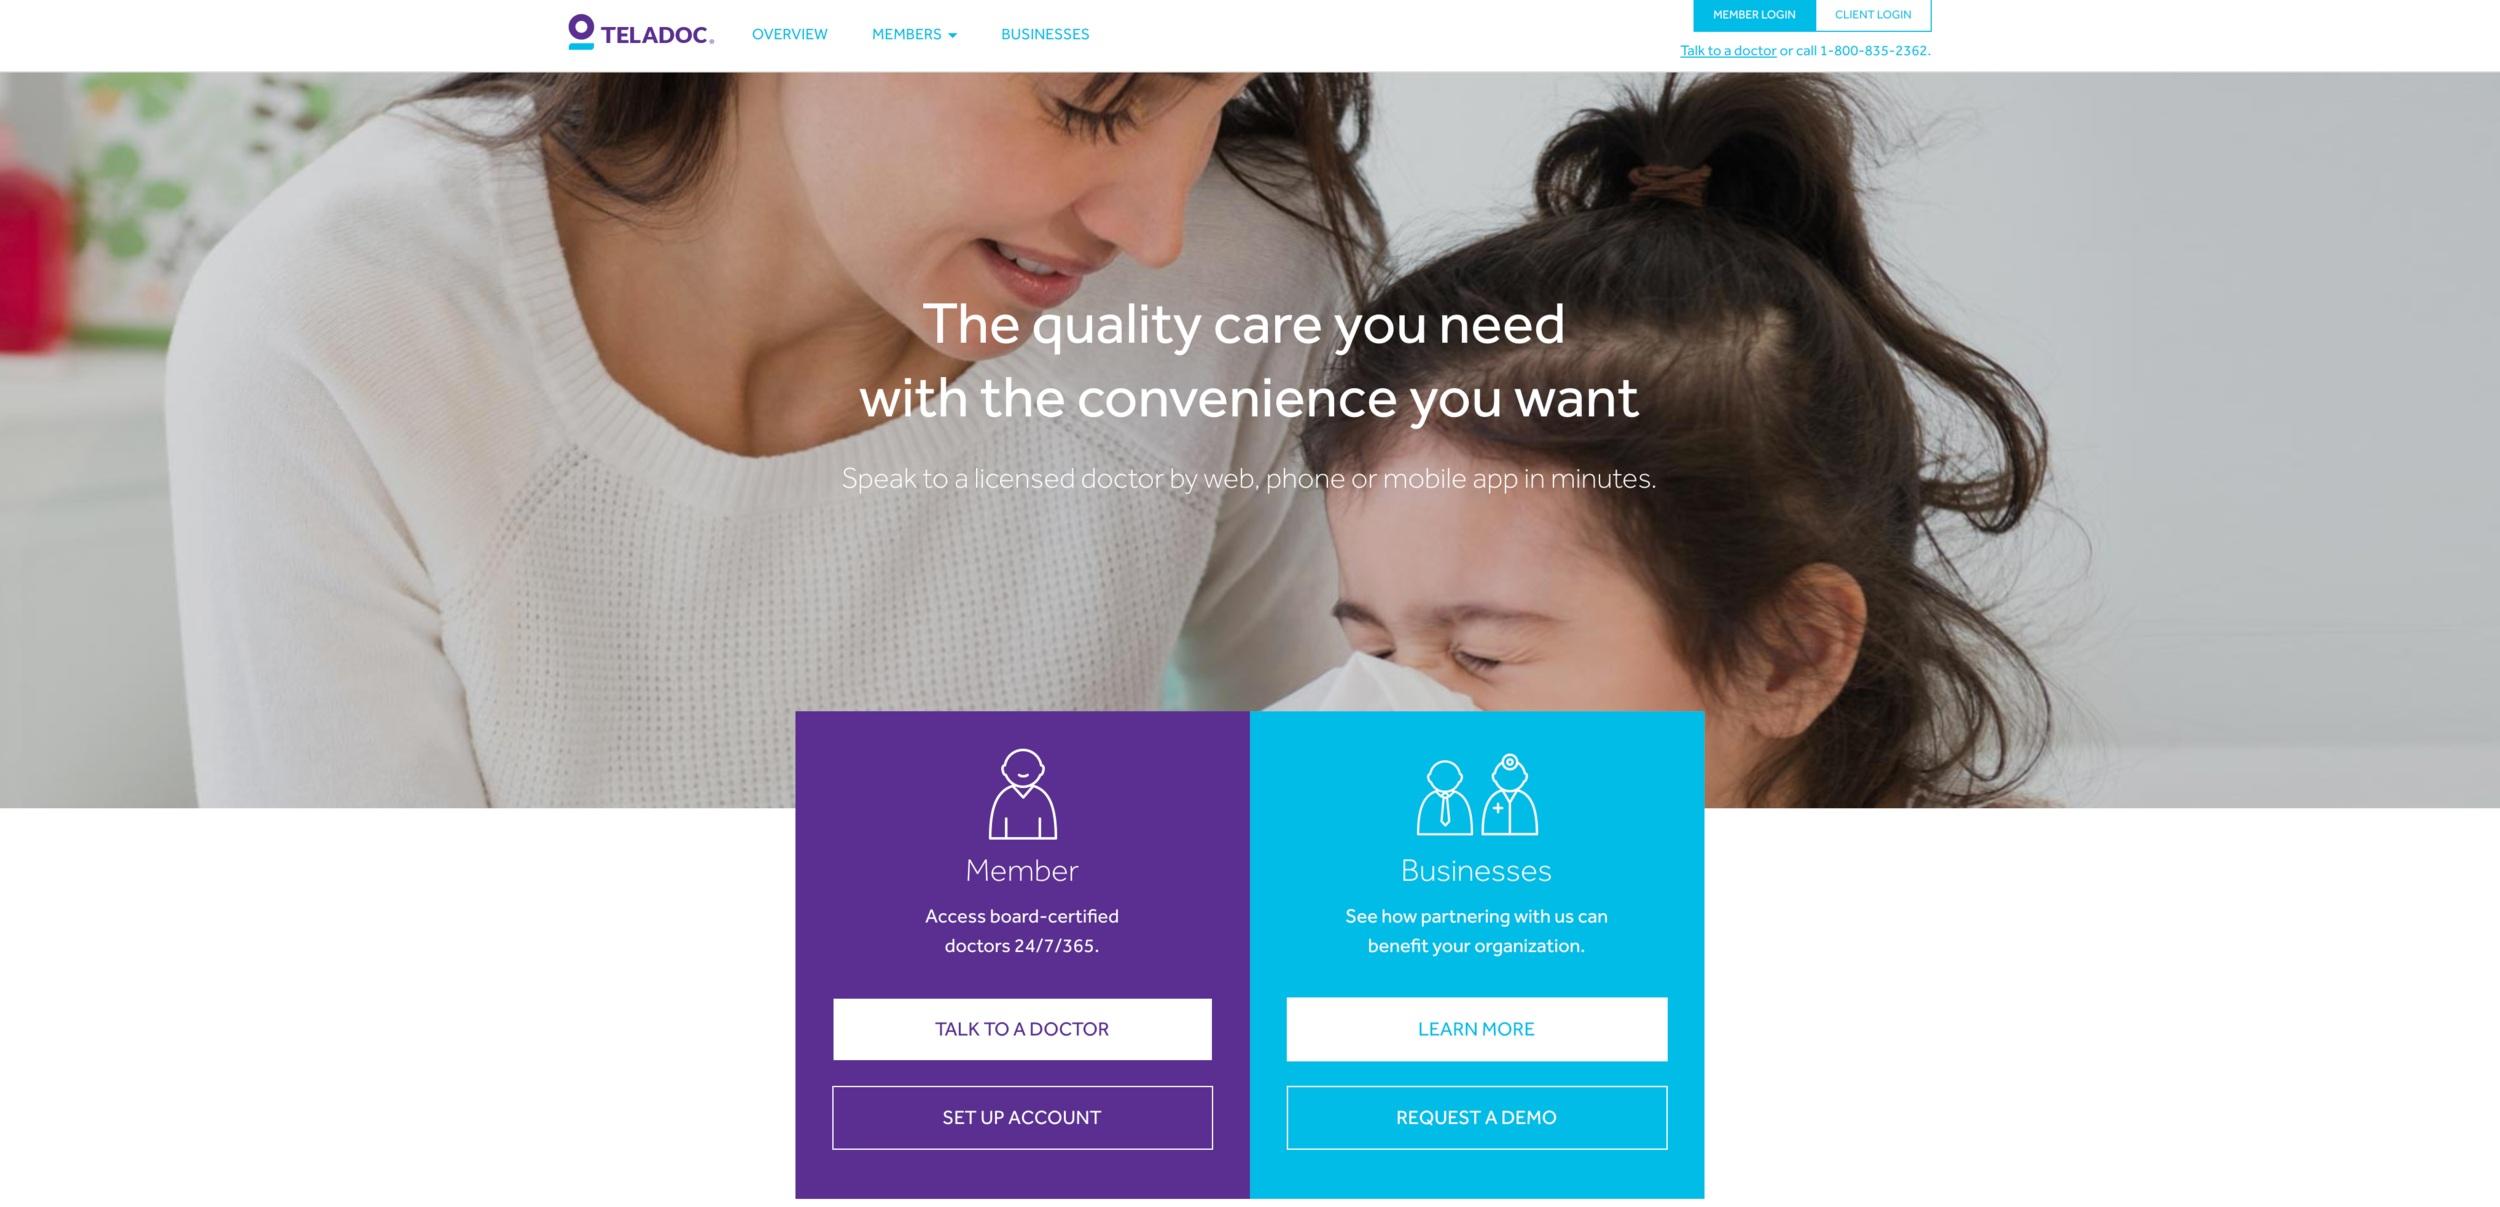 teledoc-homepage.jpg